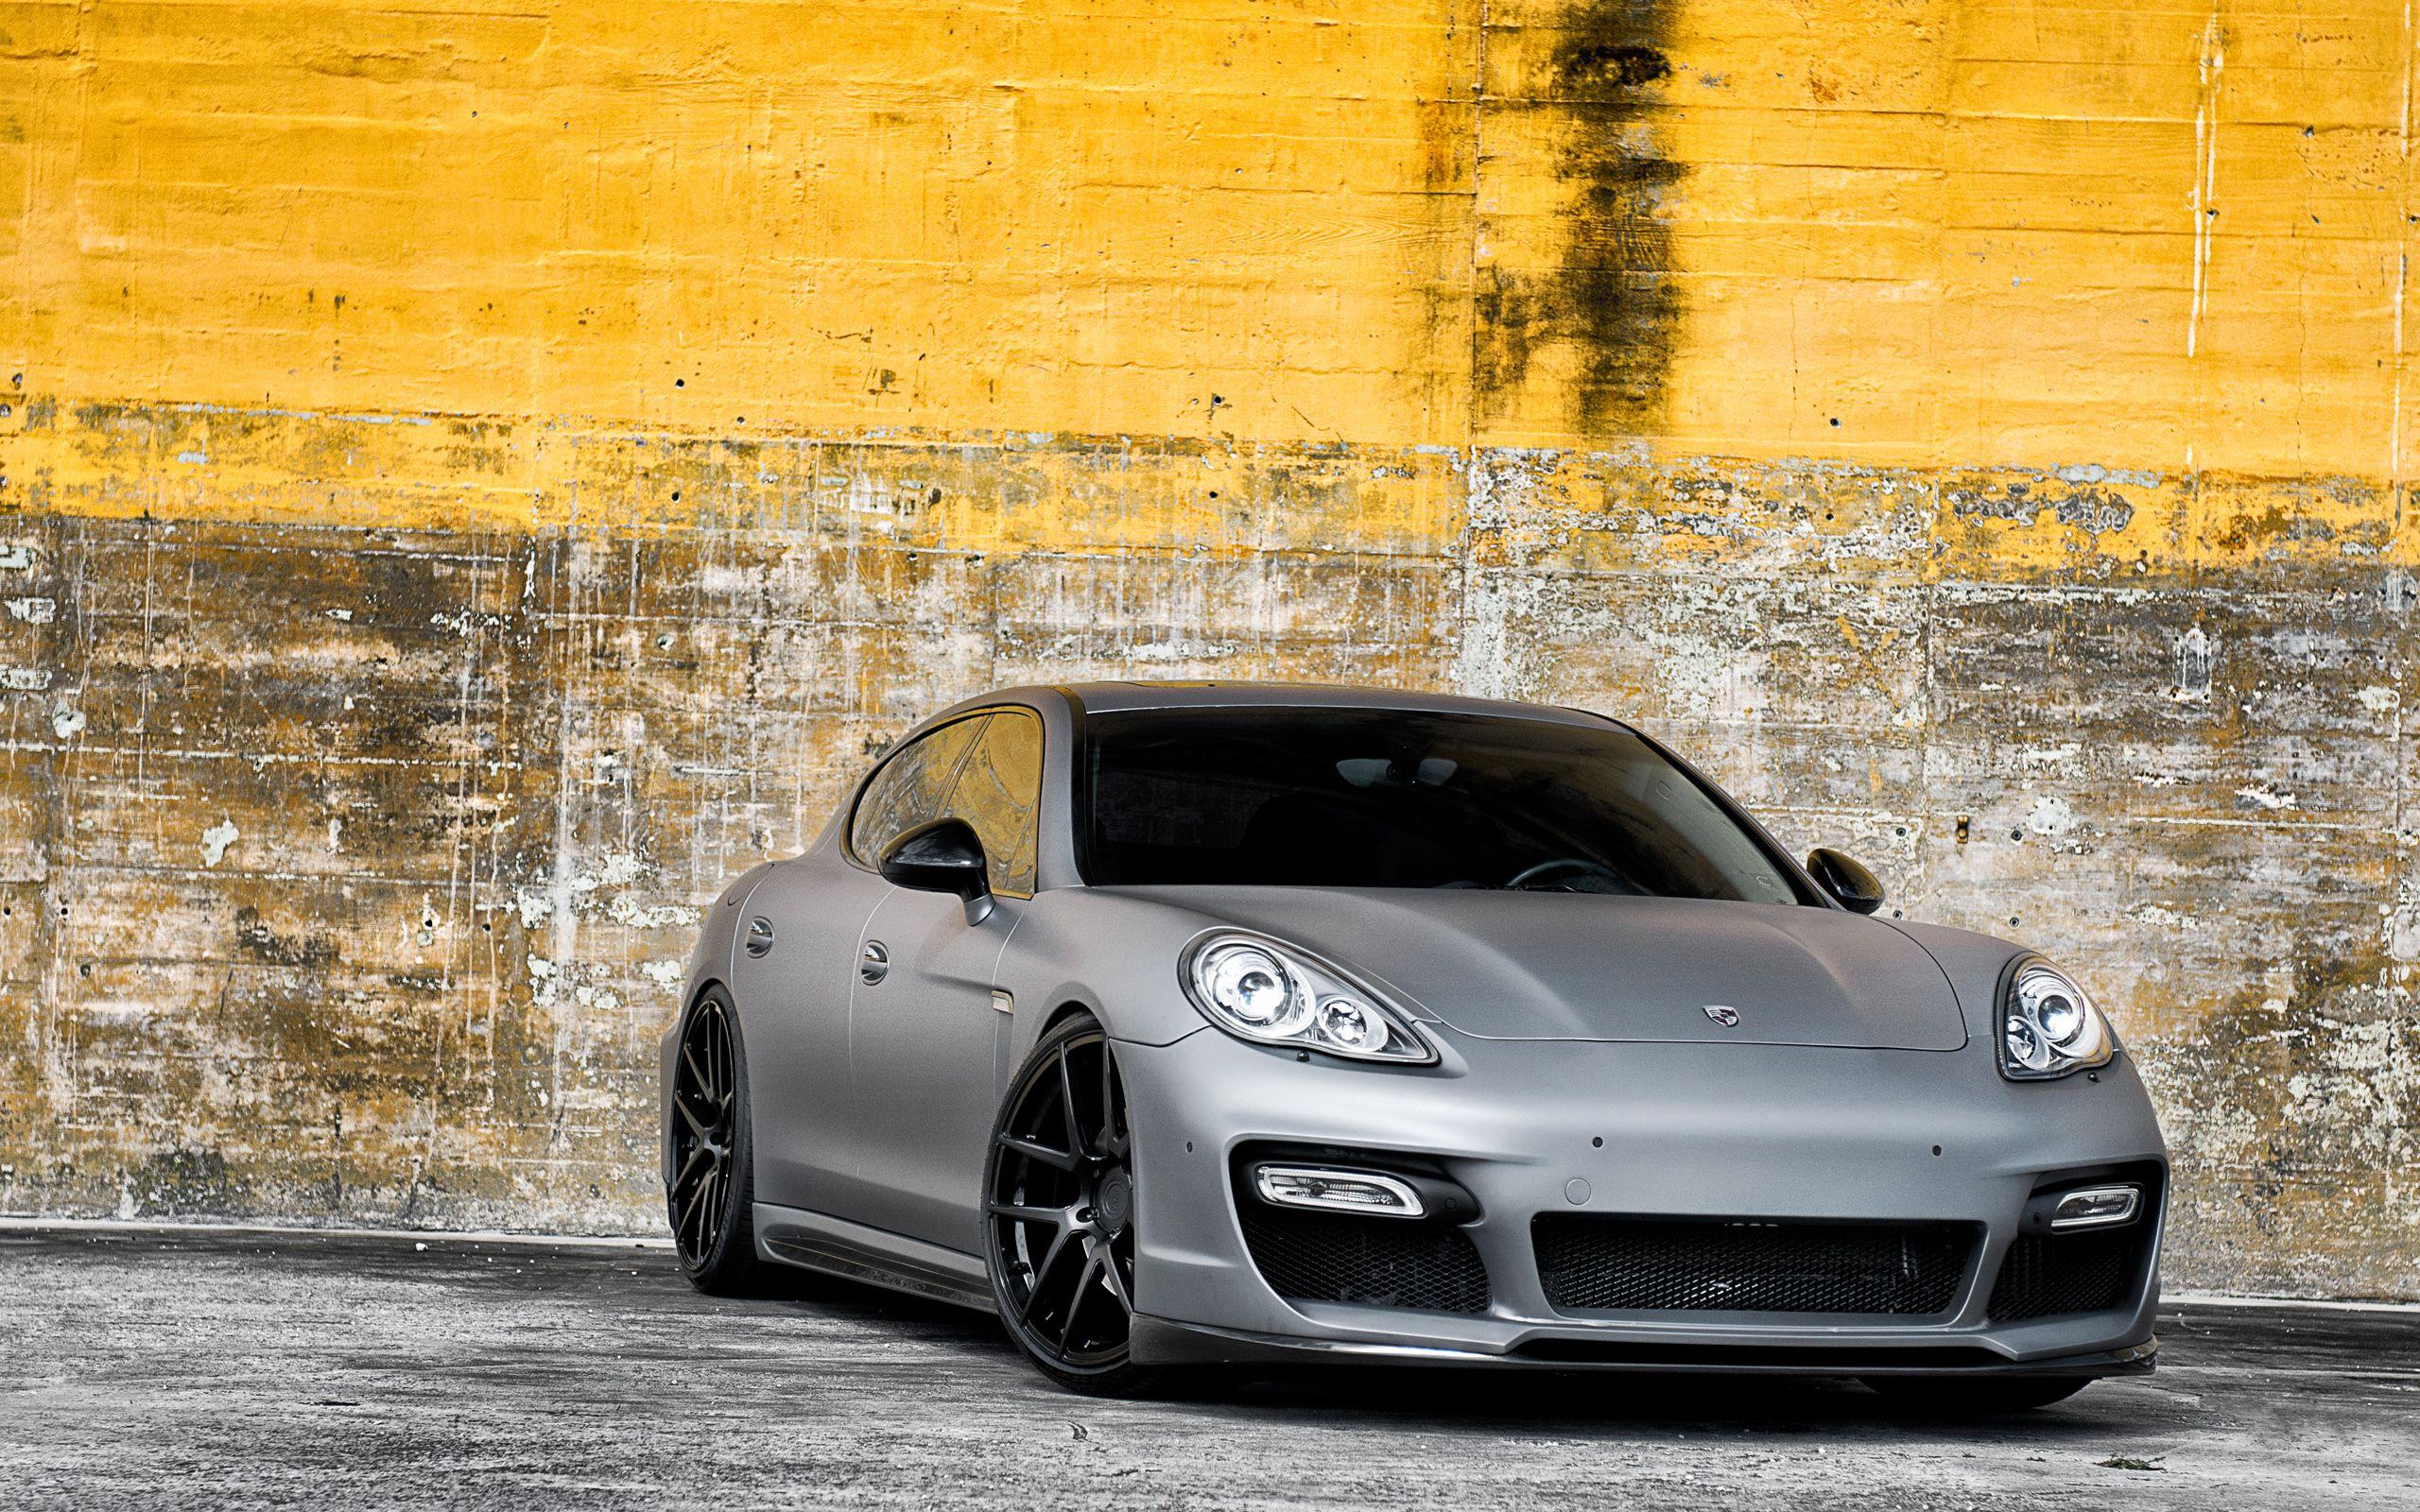 Matte Finish Porsche Panamera WallPaper HD - http://imashon.com/w ...